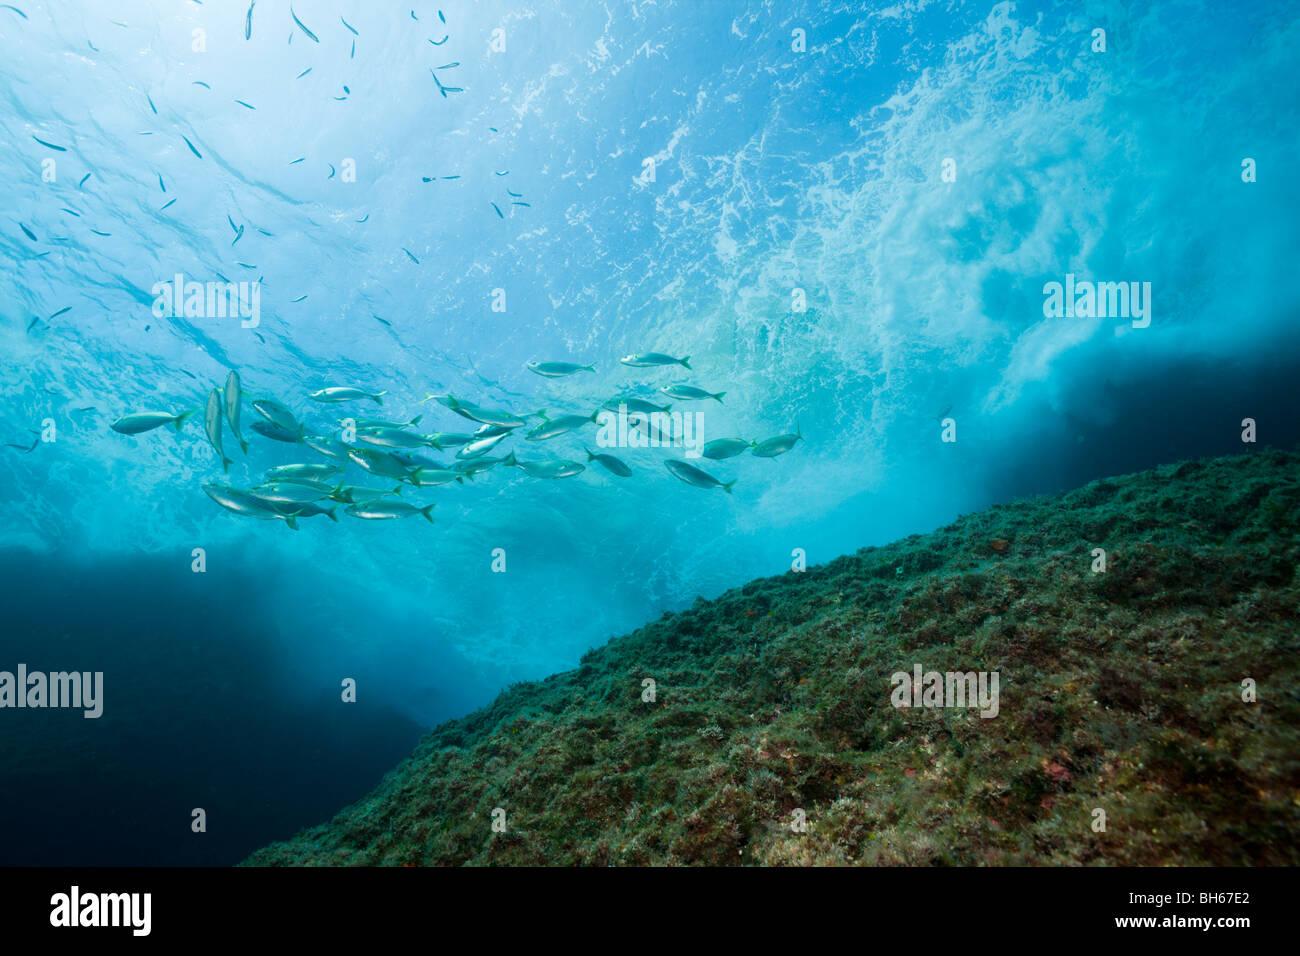 Shoal of Cow Breams, Sarpa salpa, Carall Bernat, Medes Islands, Costa Brava, Mediterranean Sea, Spain - Stock Image